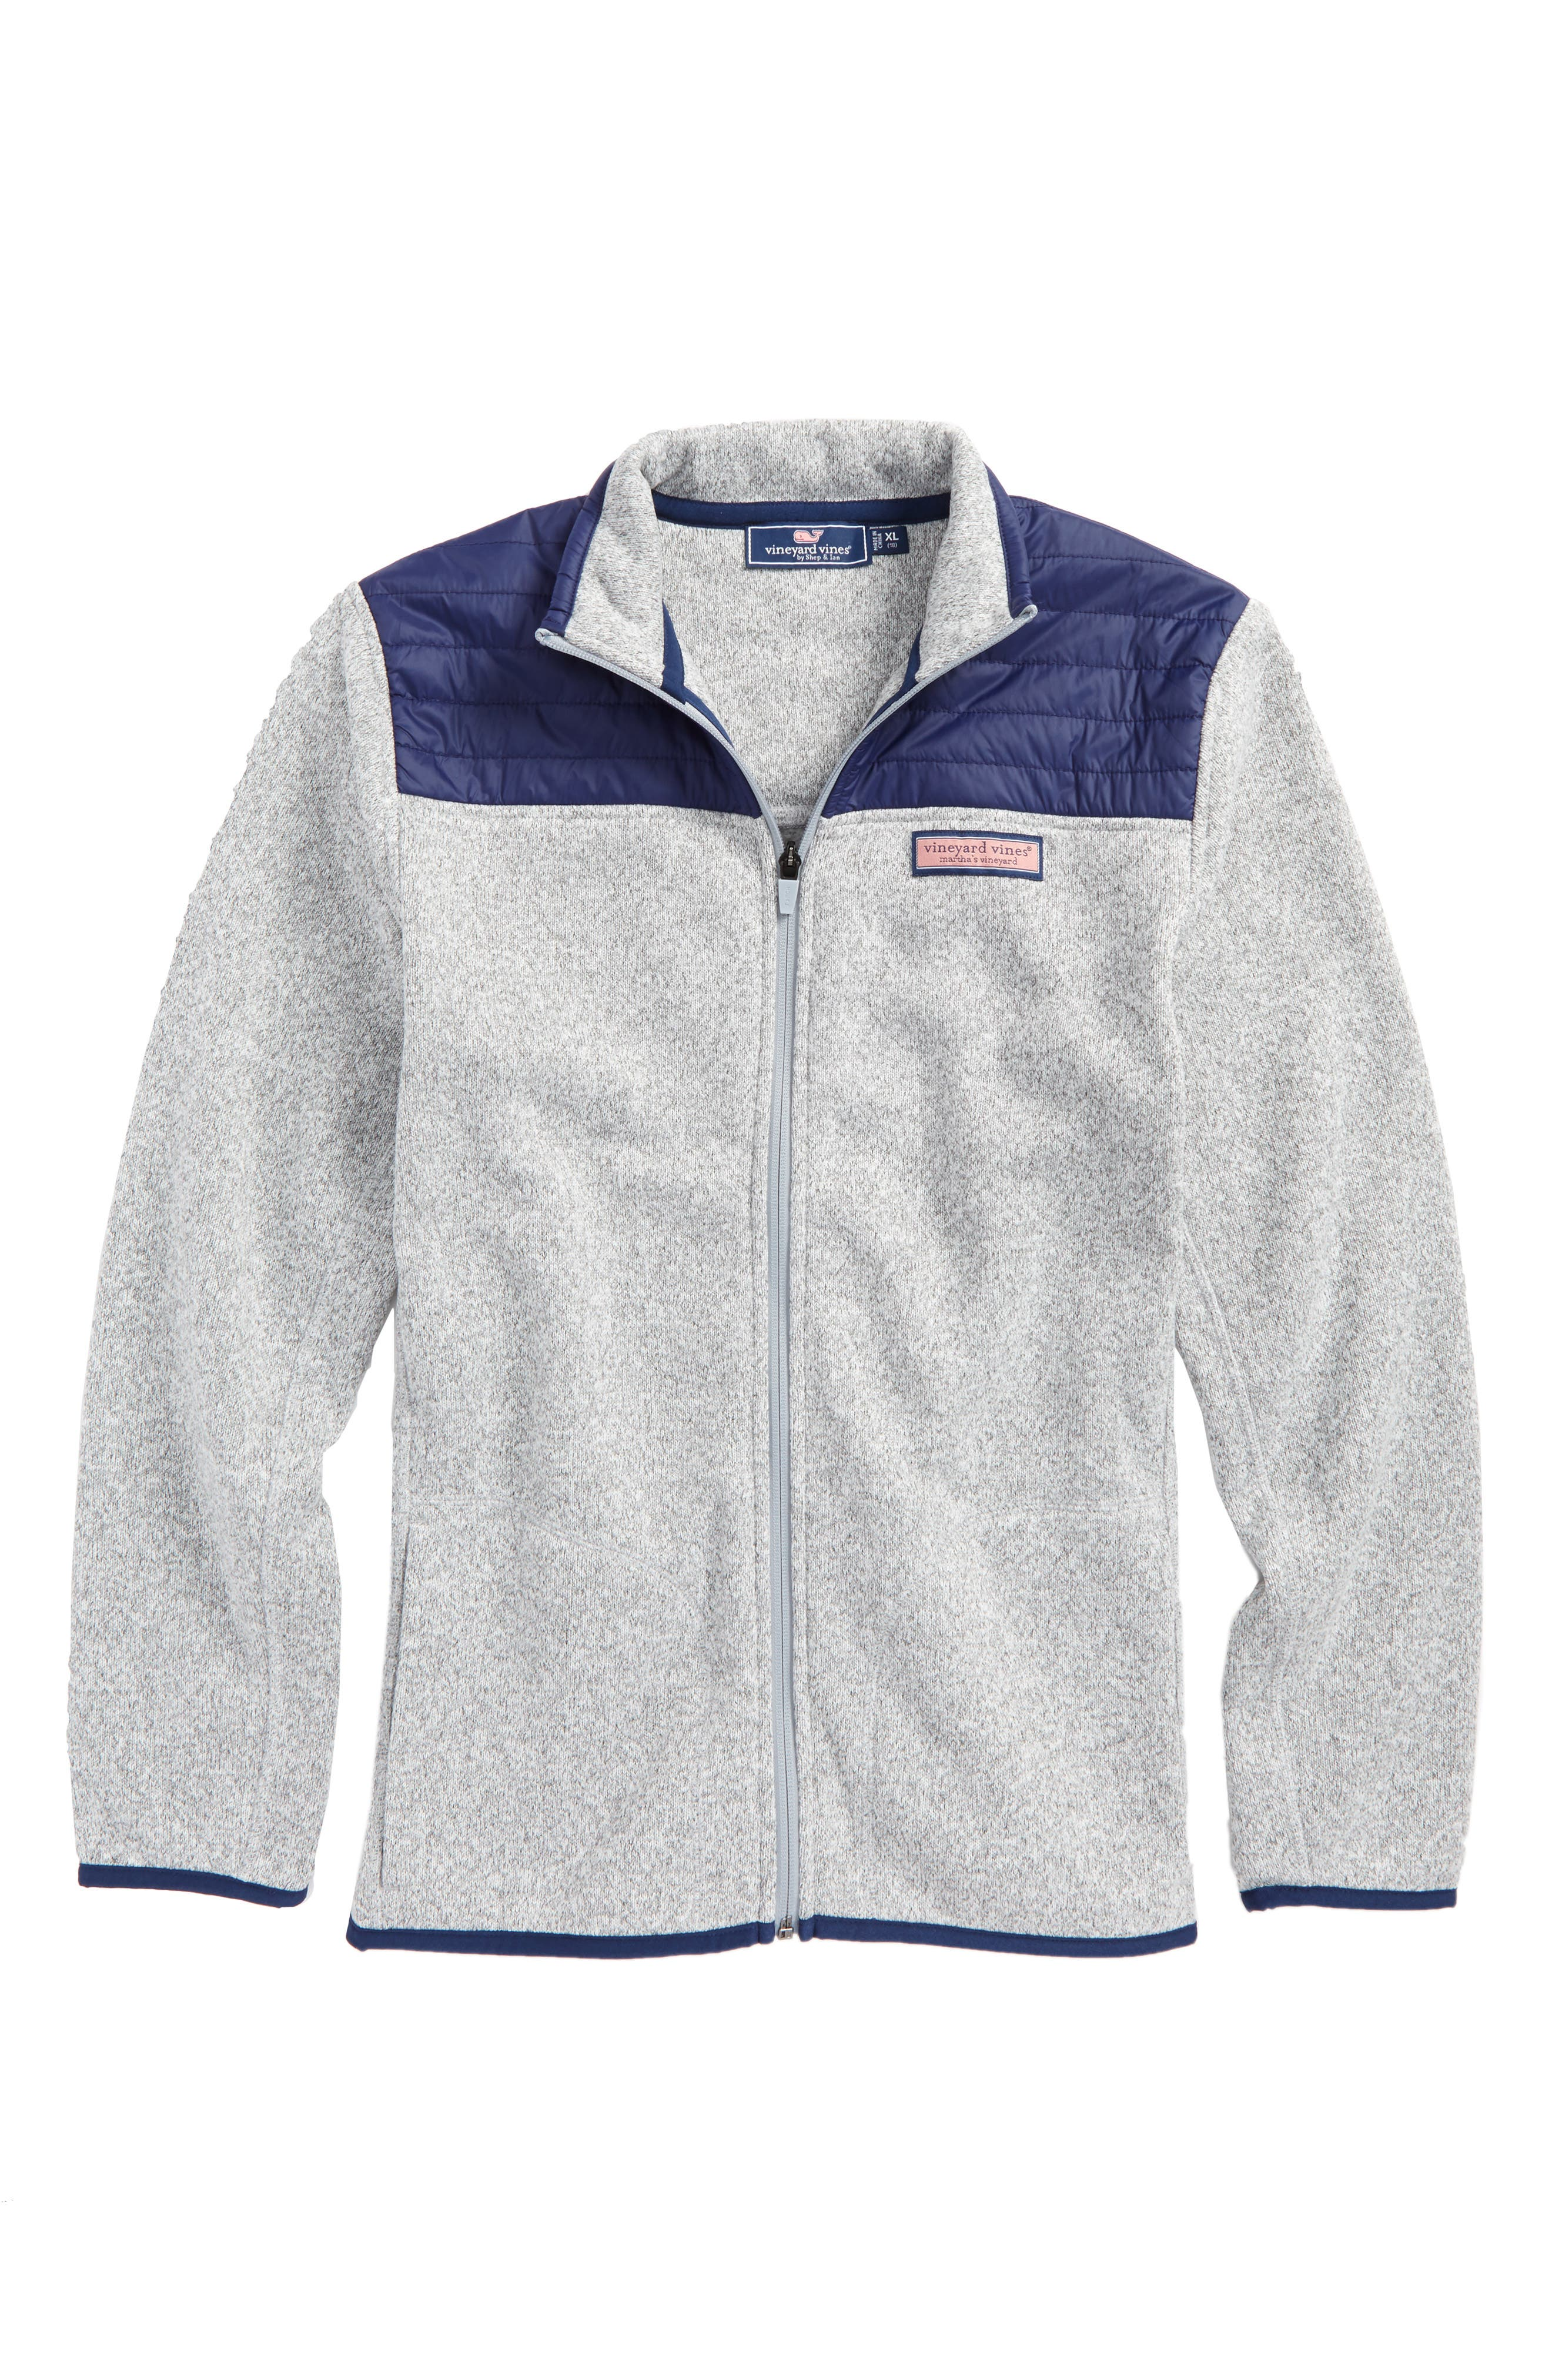 Full Zip Fleece Jacket,                             Main thumbnail 1, color,                             Gray Heather